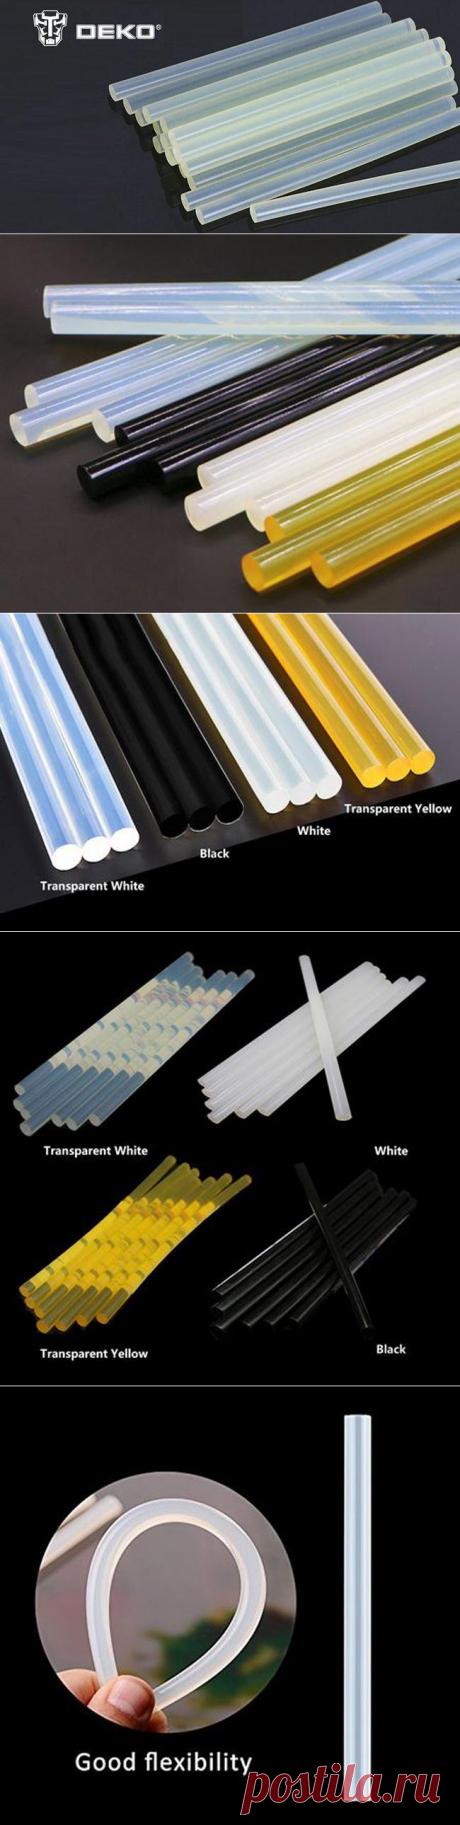 Термоклеевые стержни DEKO GJ119 (7 мм, 11 мм) с Алиэкспресс   Super-Blog